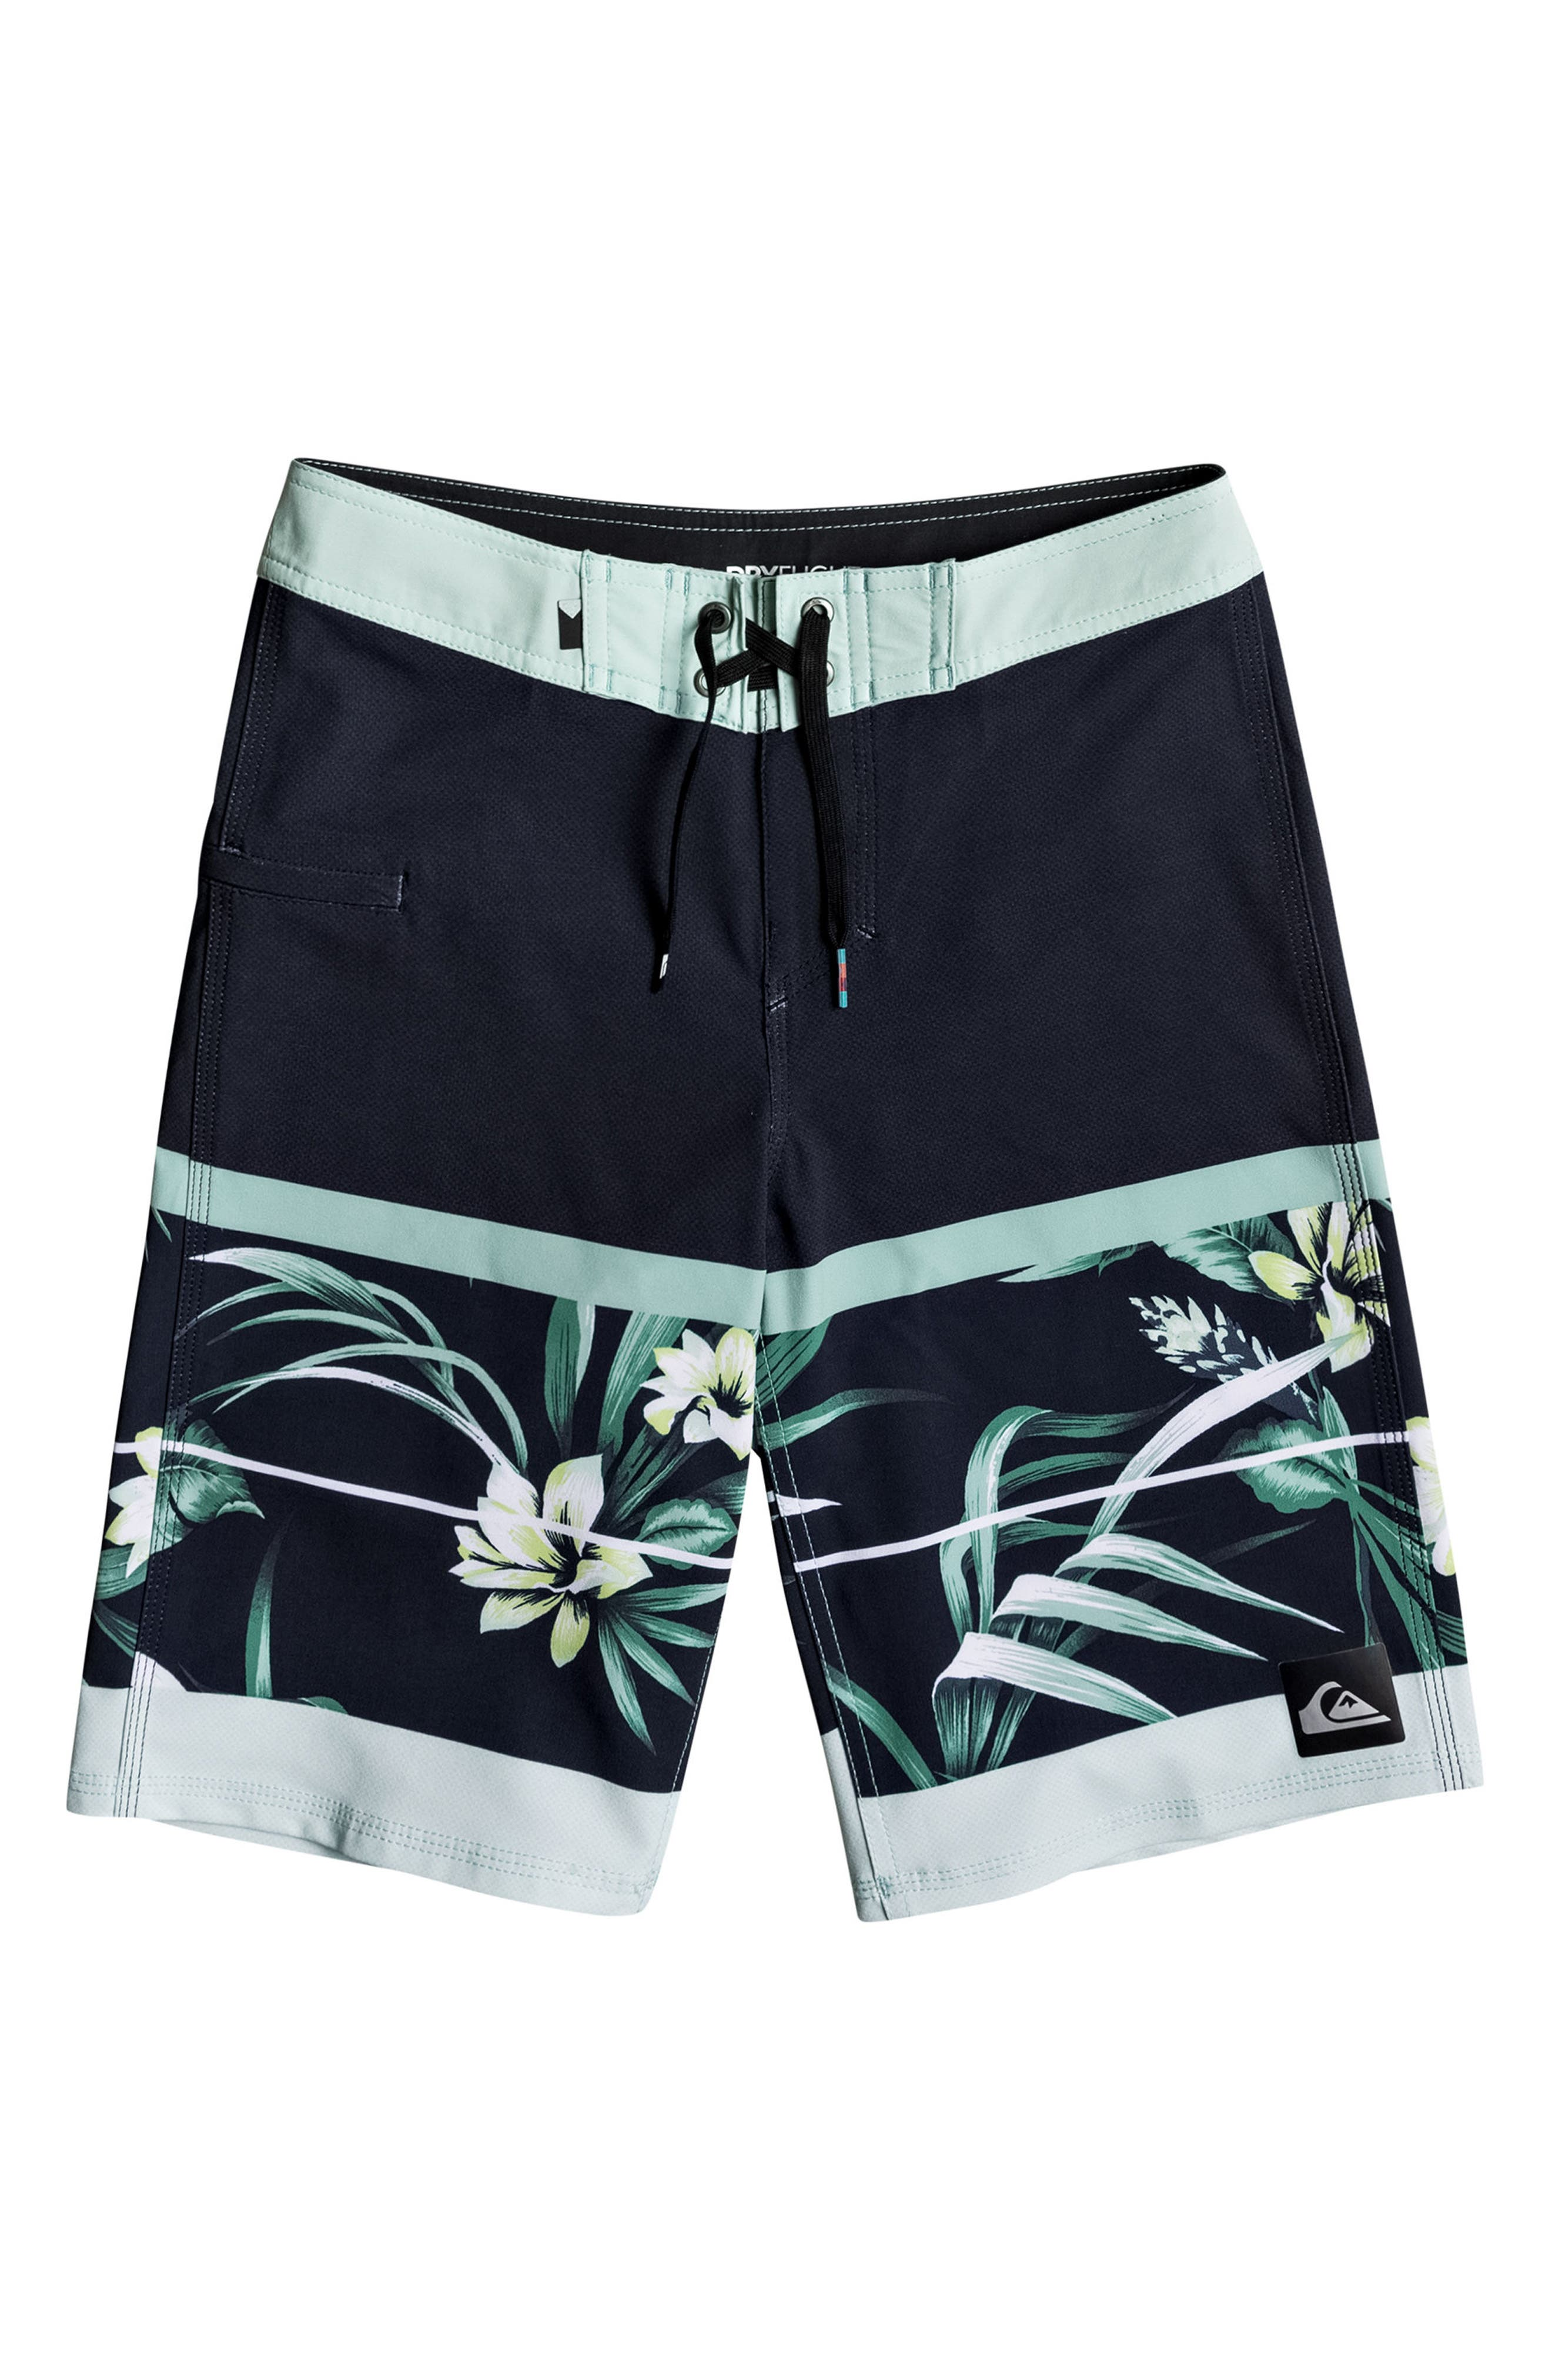 Slab Island Vee Board Shorts,                             Main thumbnail 1, color,                             Navy Blazer